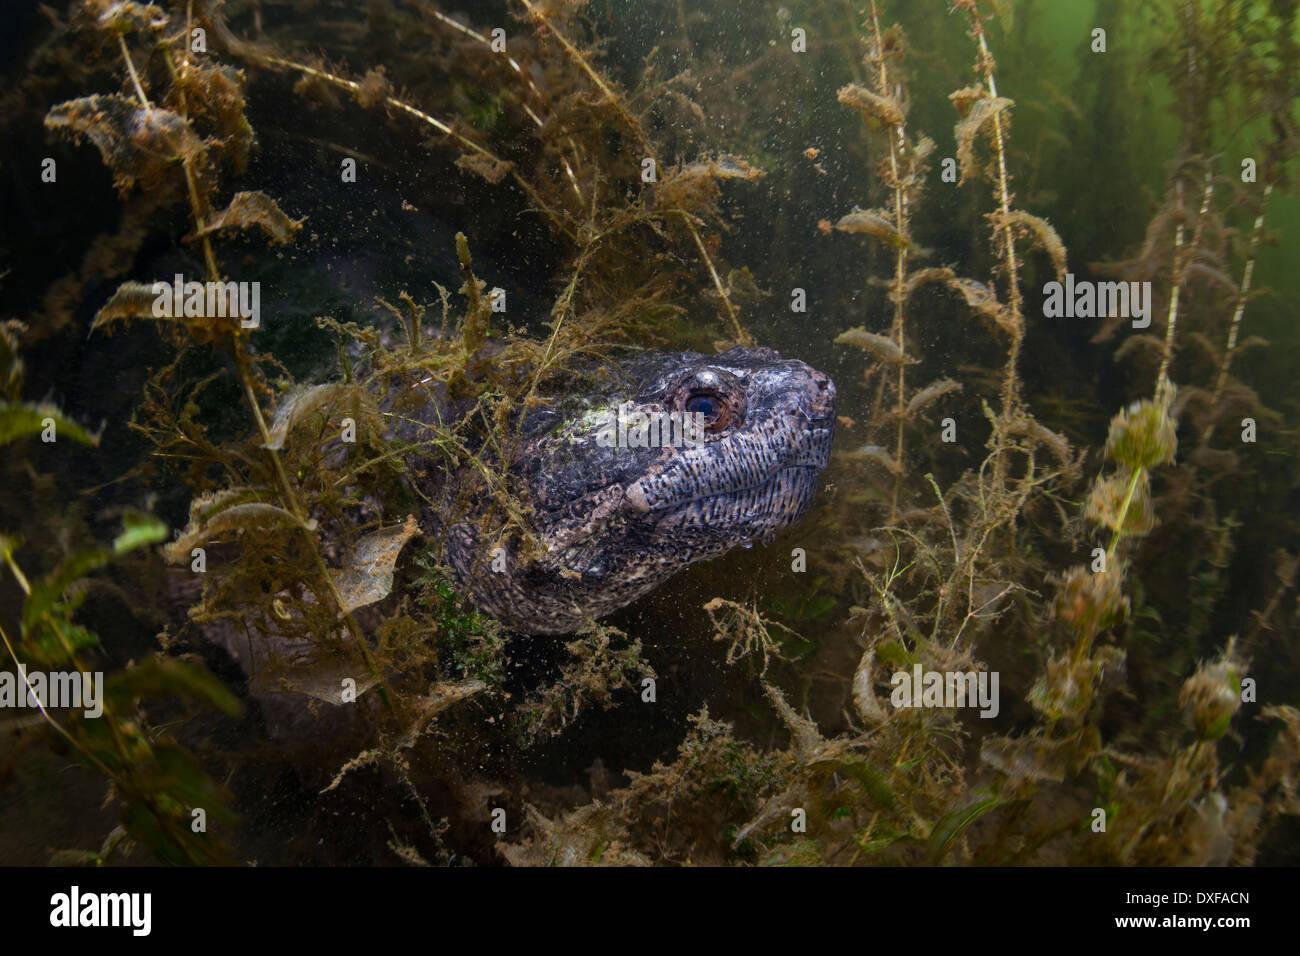 Common Snapping Turtle, Chelydra serpentina, Massachusetts, Cape Cod, USA Stock Photo